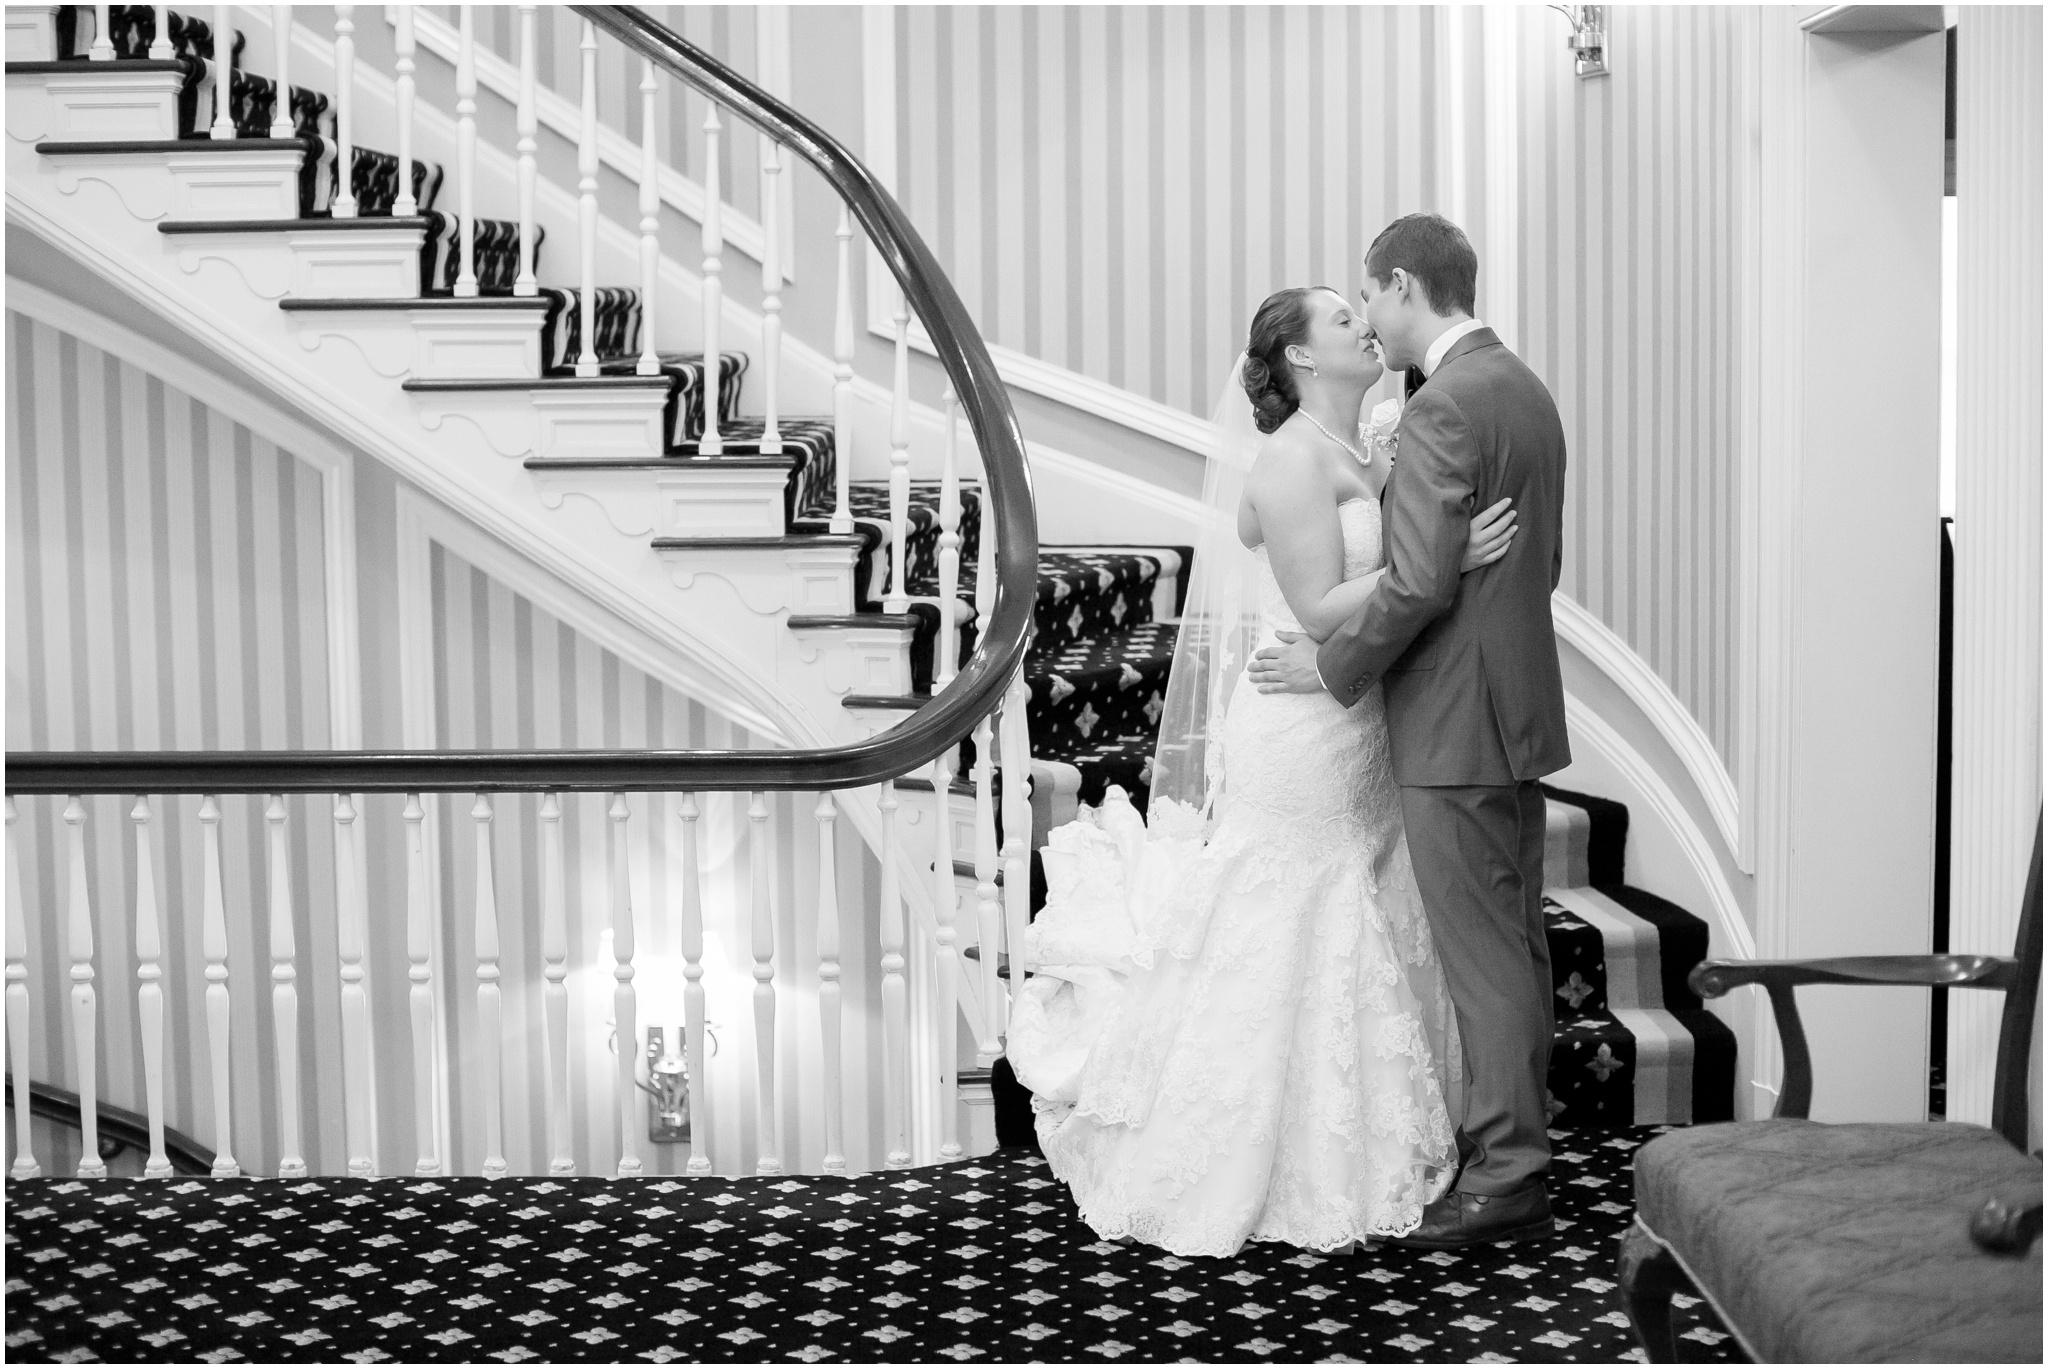 Madison_Club_Madison_Wisconsin_Wedding_Photographer_Spring_Rainy_Wedding_2598.jpg